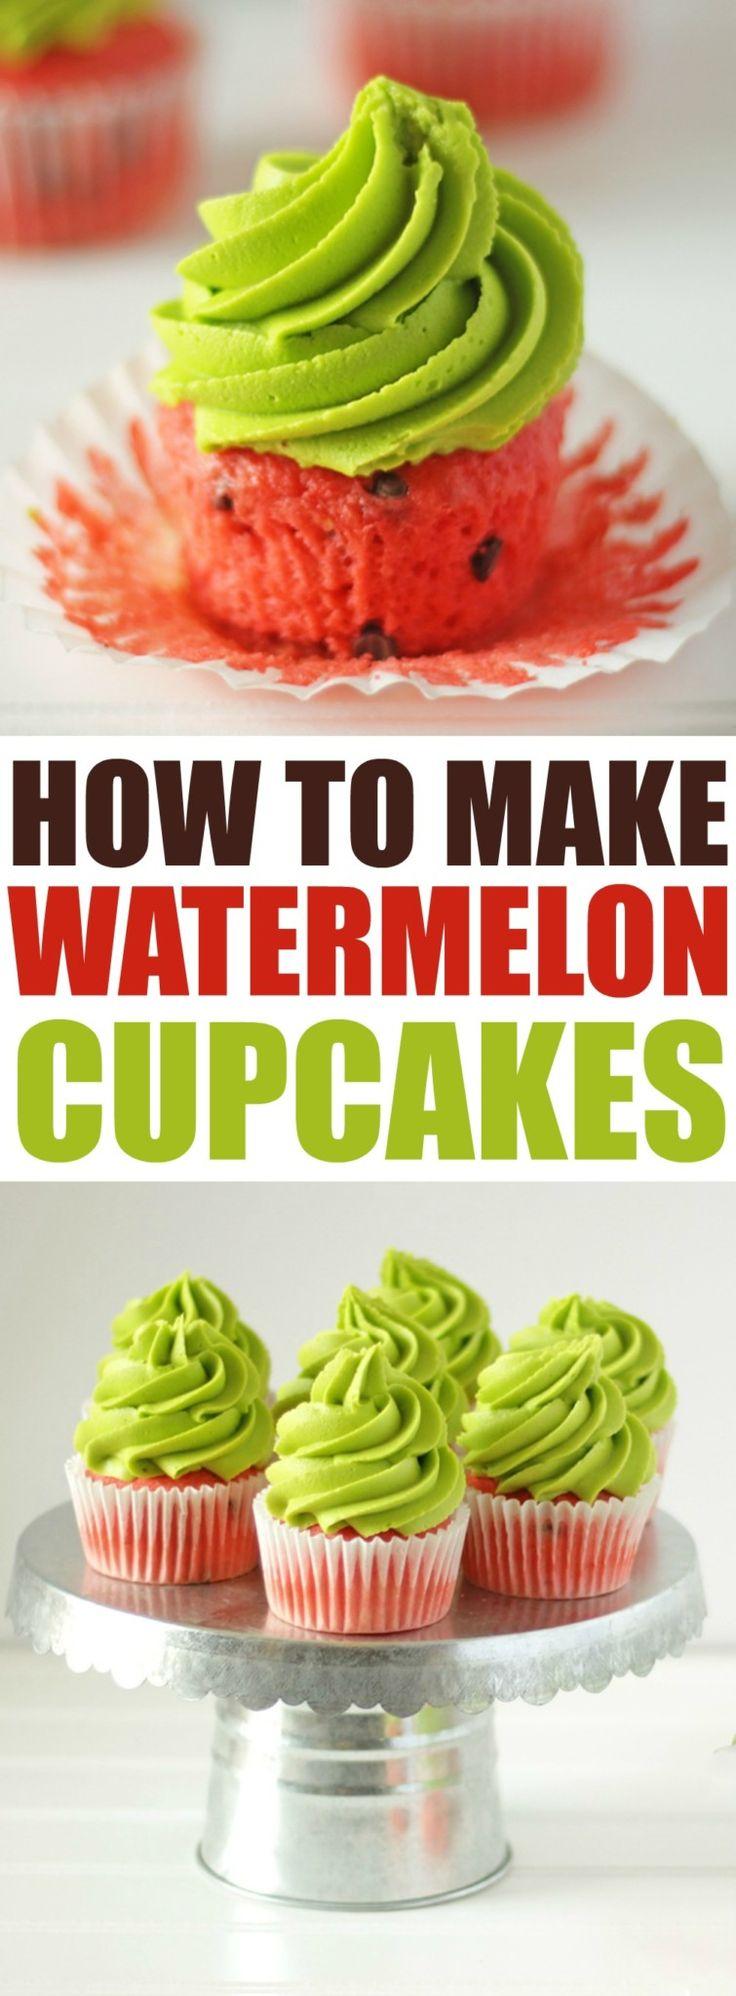 How to Make Watermelon Cupcakes at RoseBakes